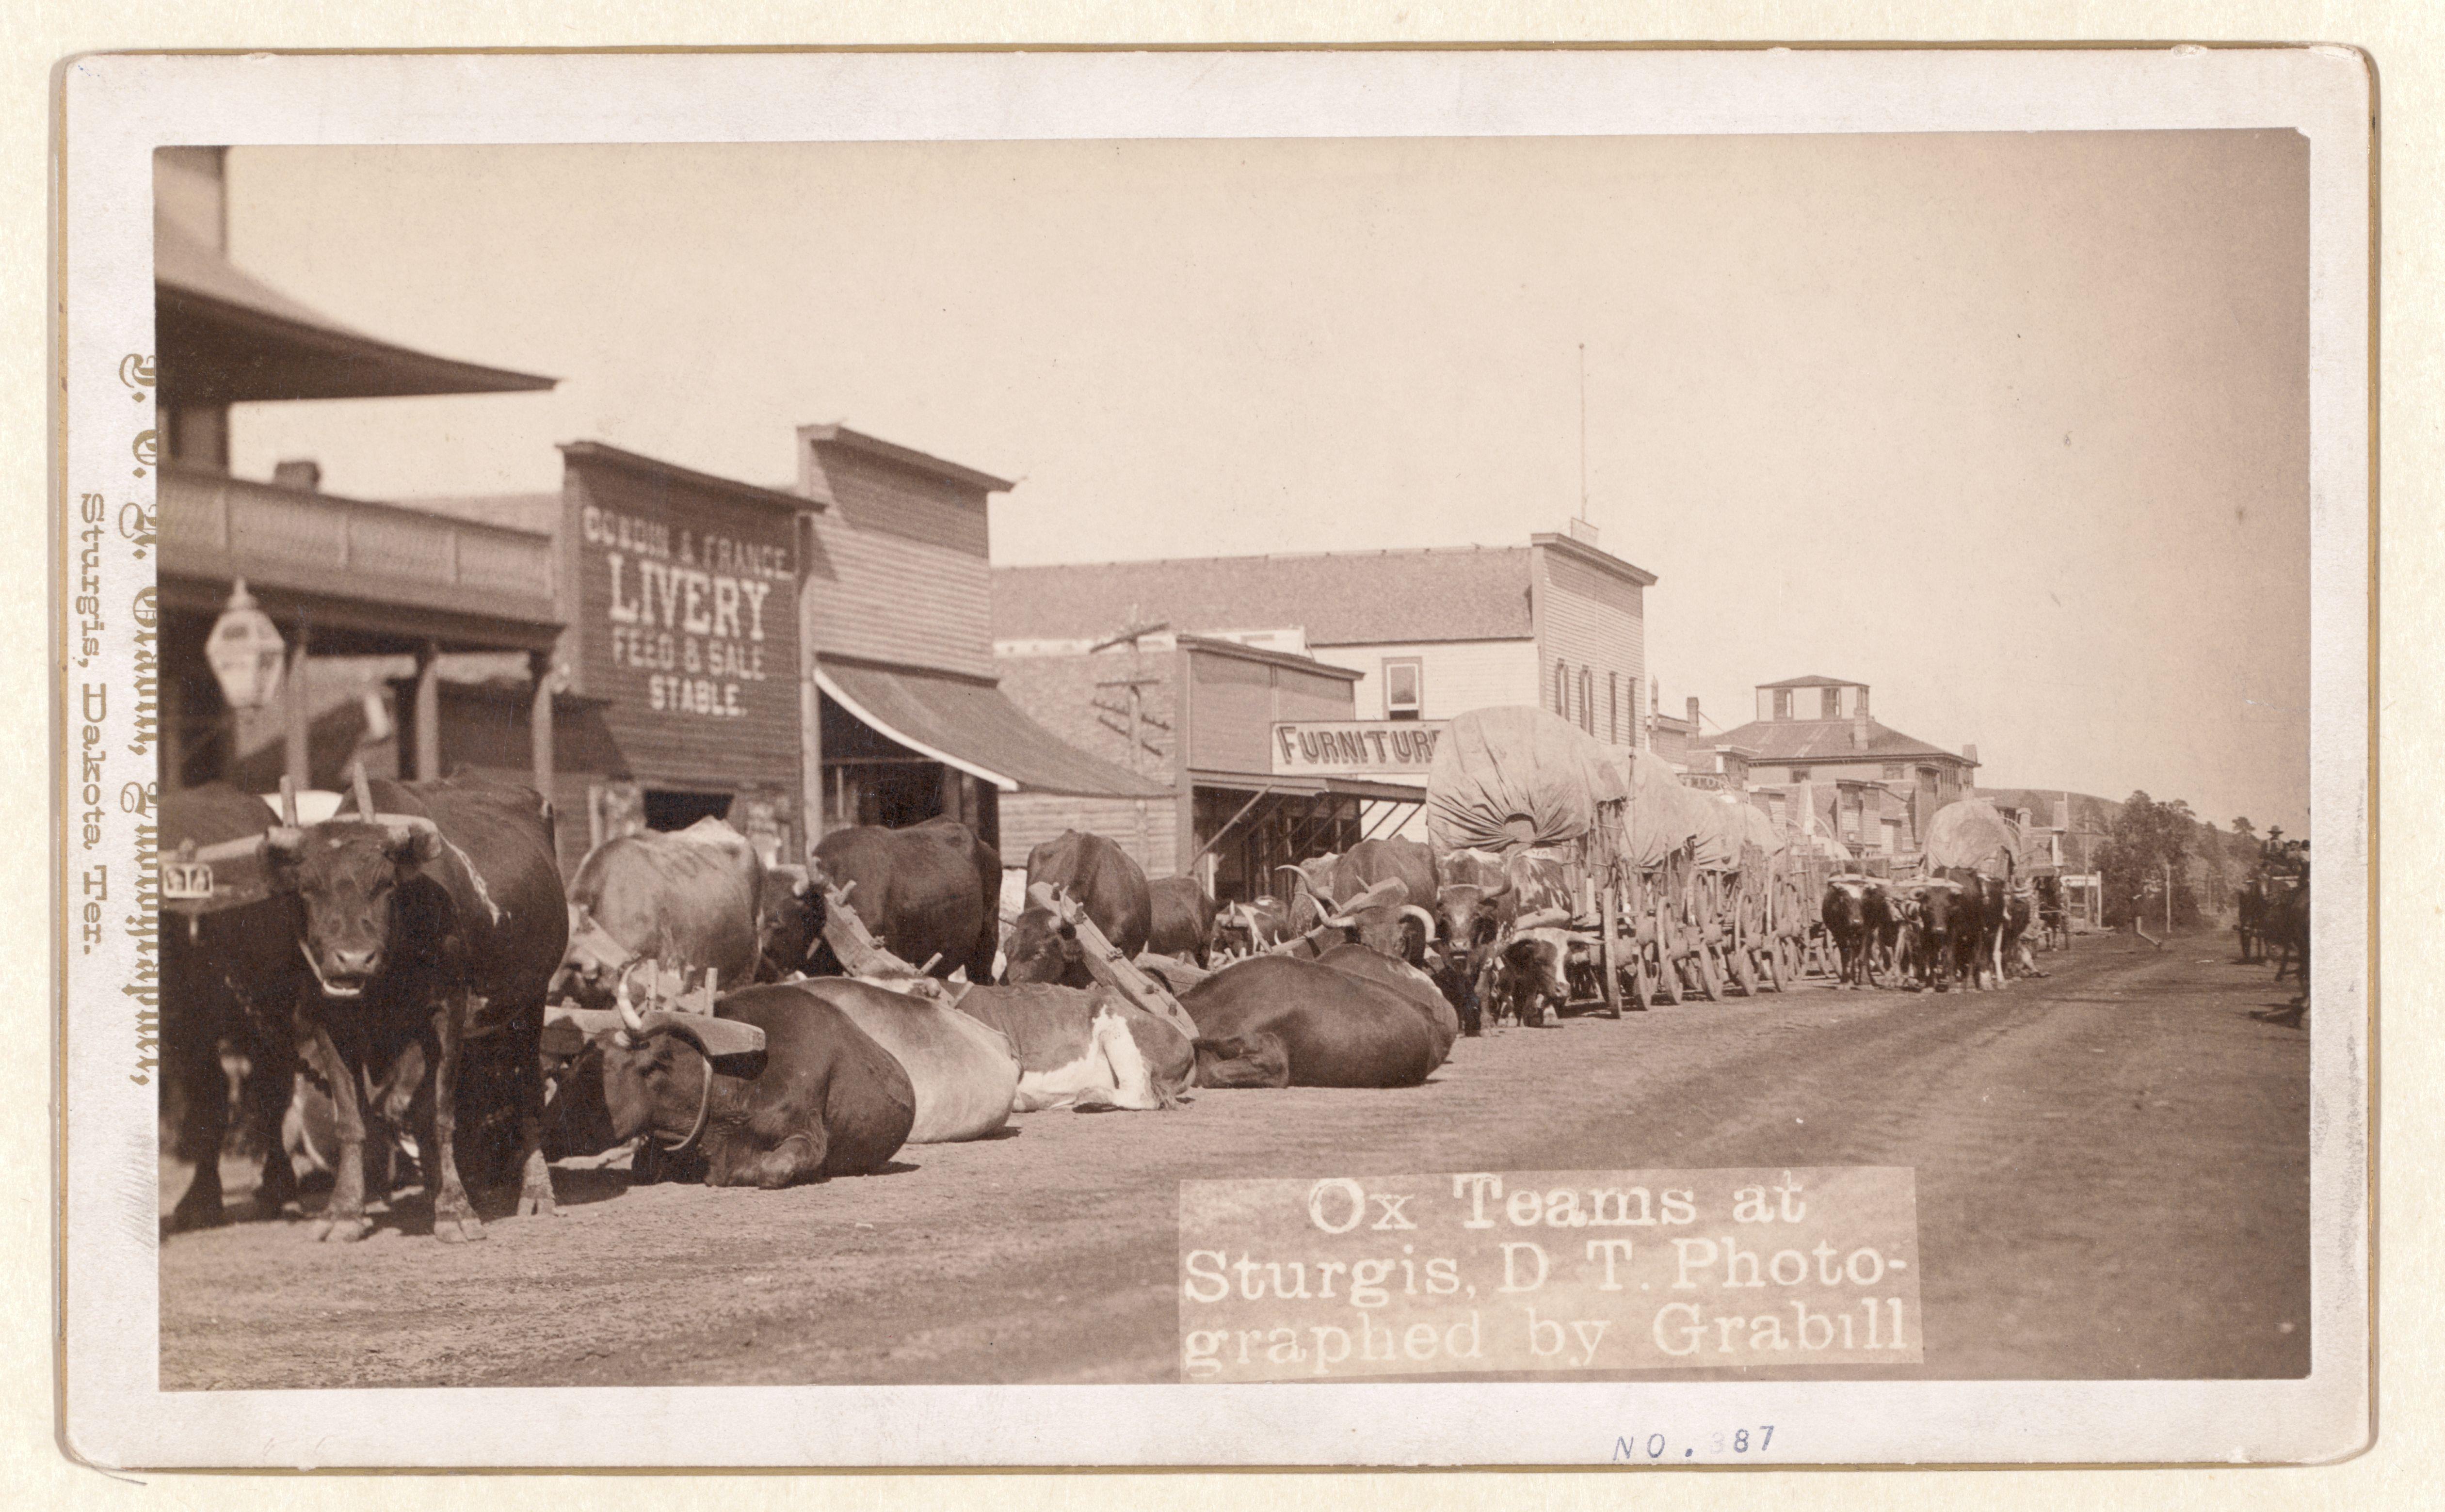 South dakota meade county howes - South Dakota Meade County Howes 5